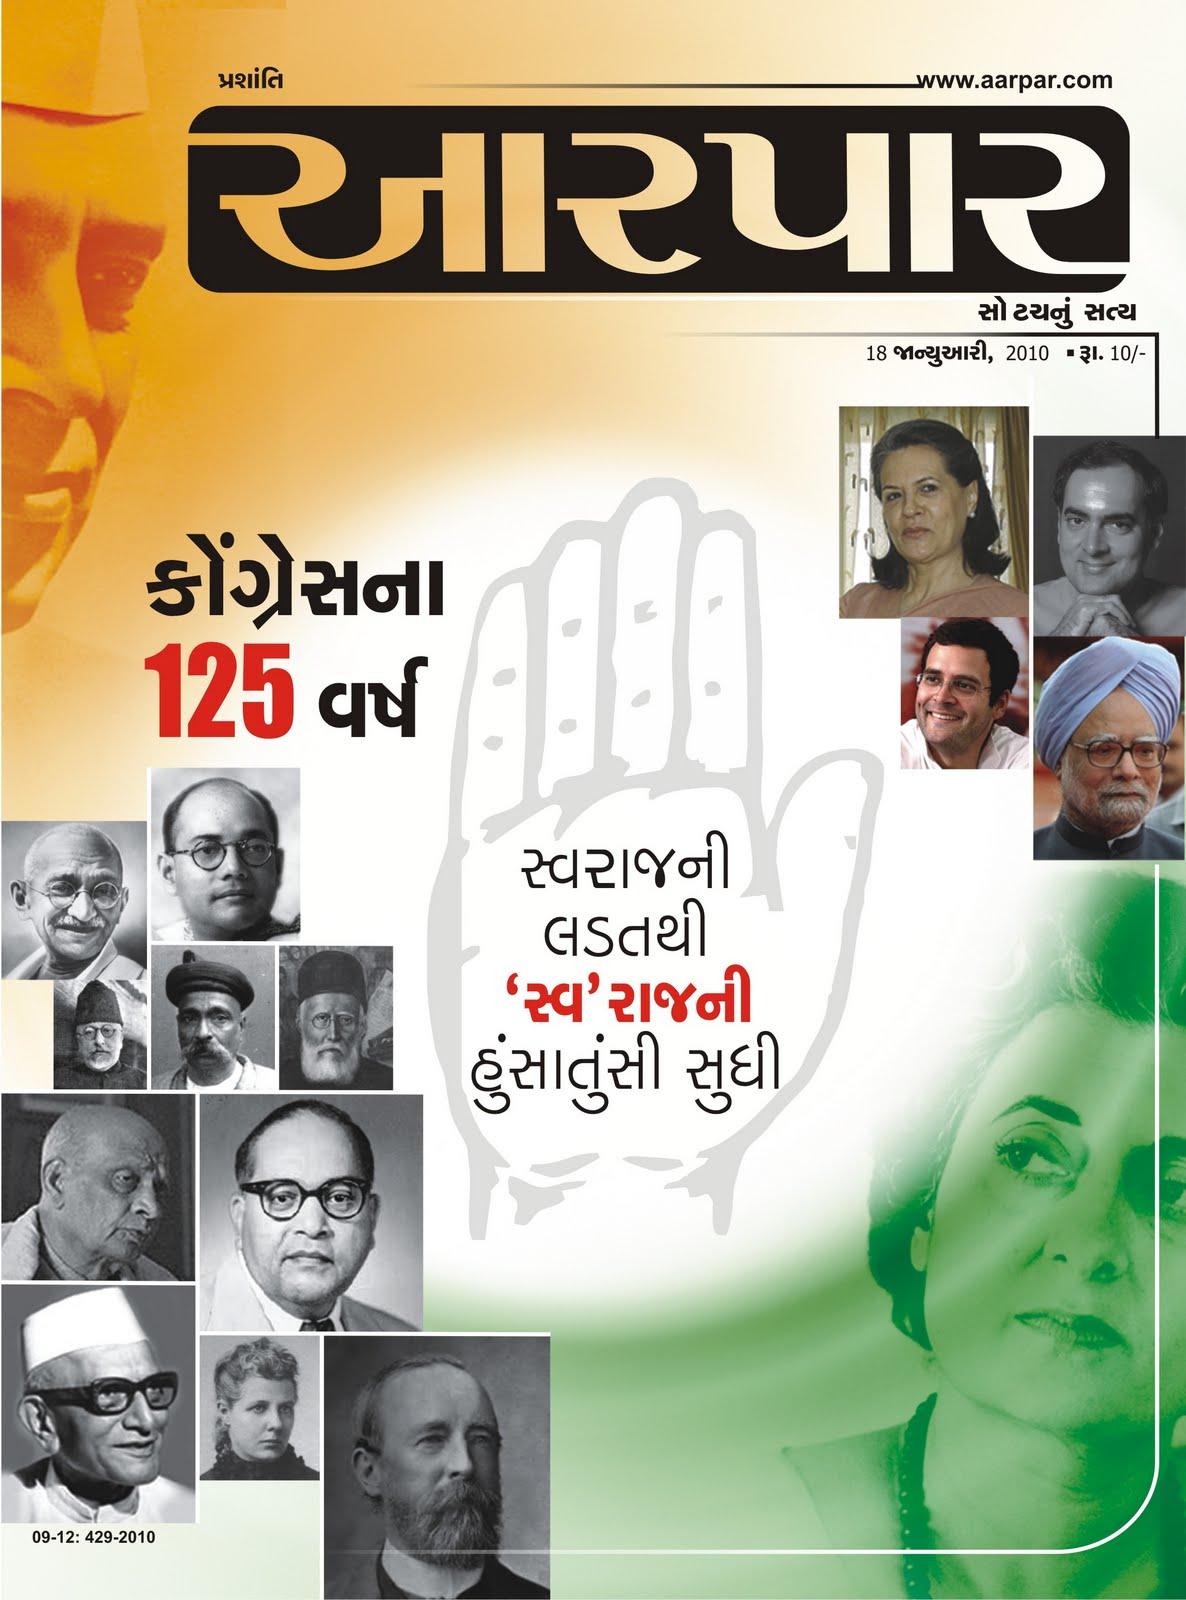 art-o-graphs: indian national congress